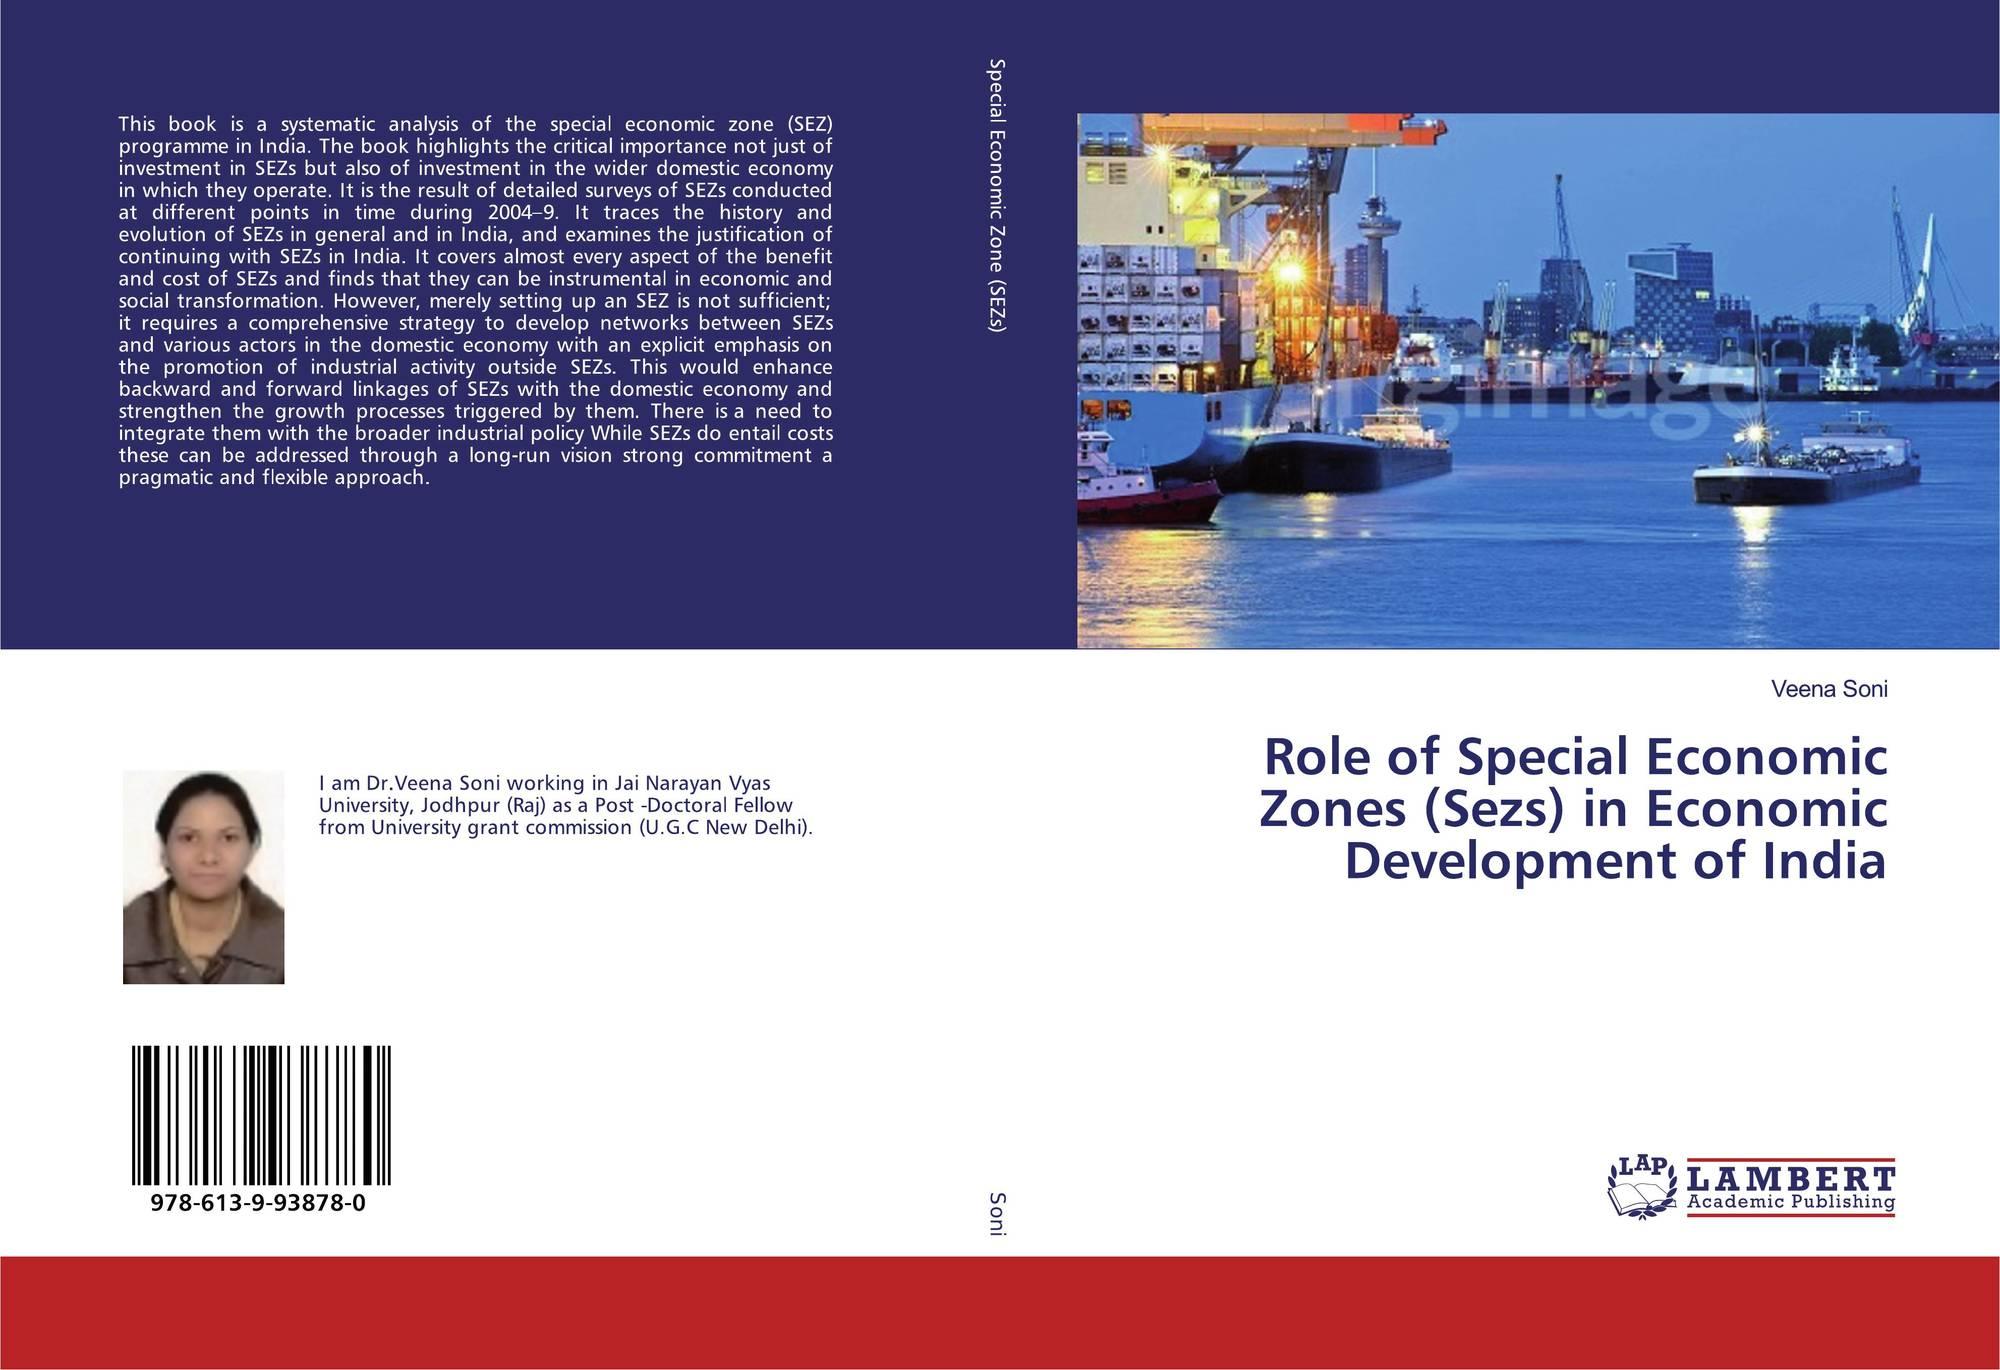 Role of Special Economic Zones (Sezs) in Economic